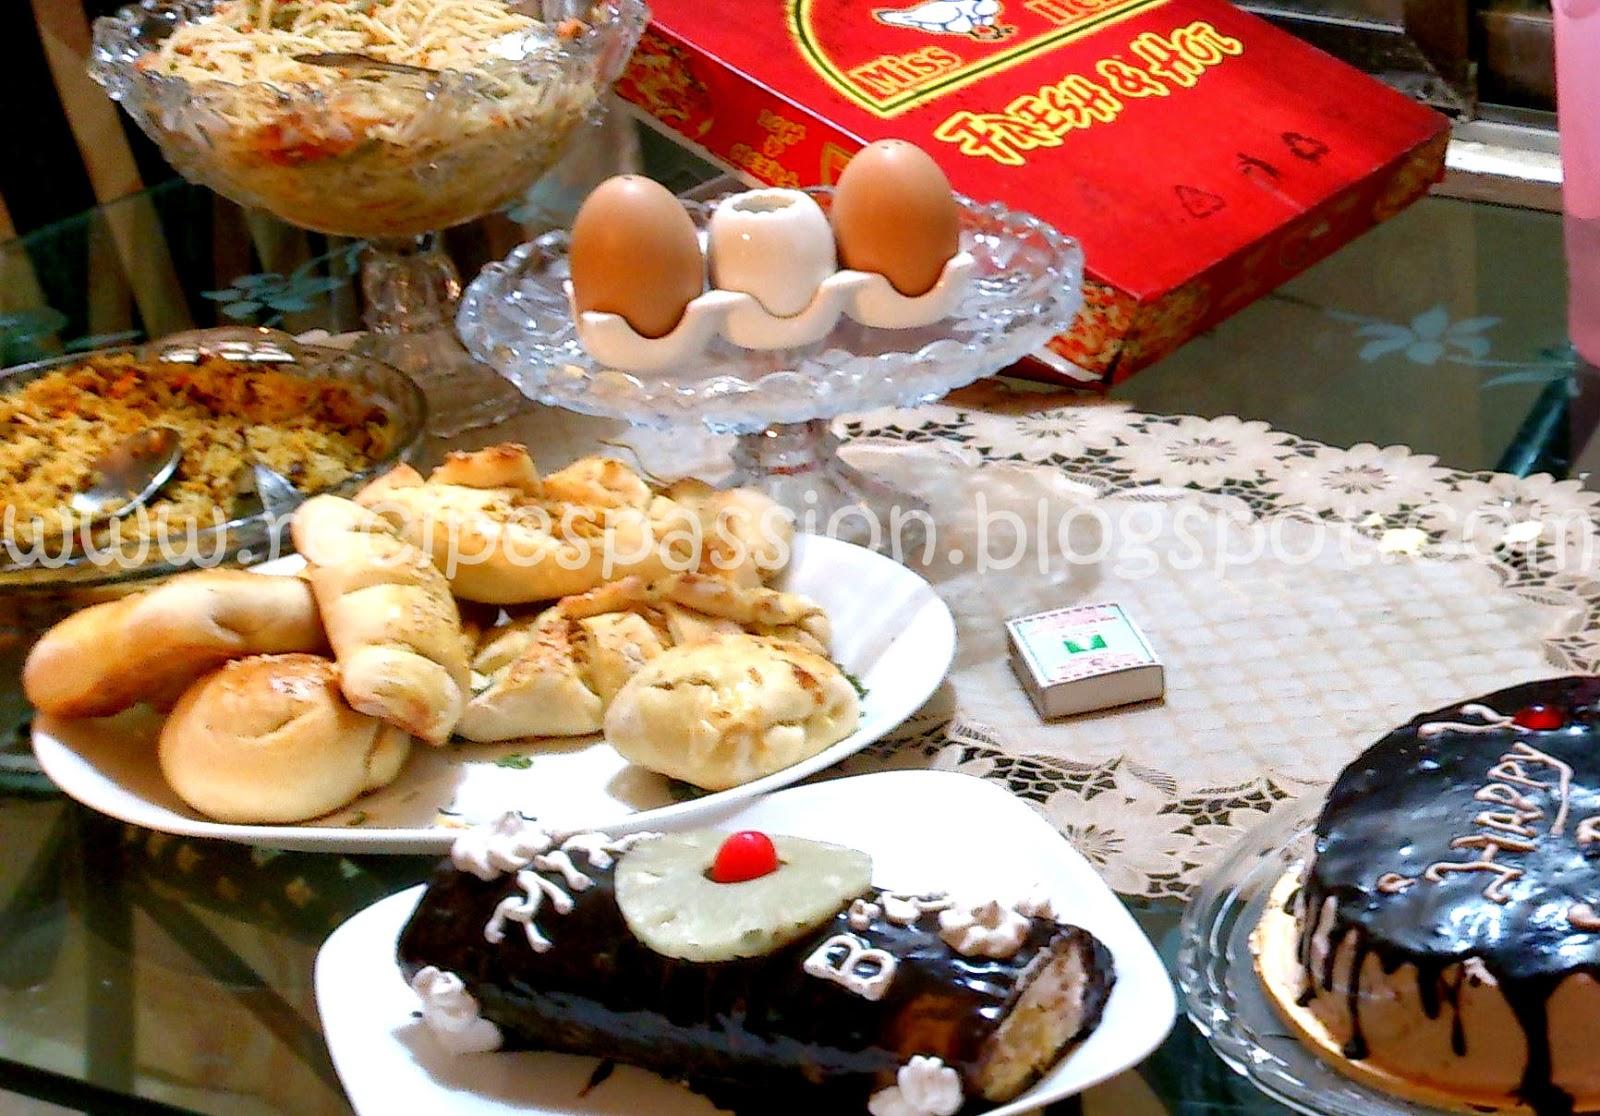 chocolate recipes, swiss roll recipe, chocolate birthday cake recipe, birthday cake recipes, cream, vanilla, simple vanilla recipe, baking